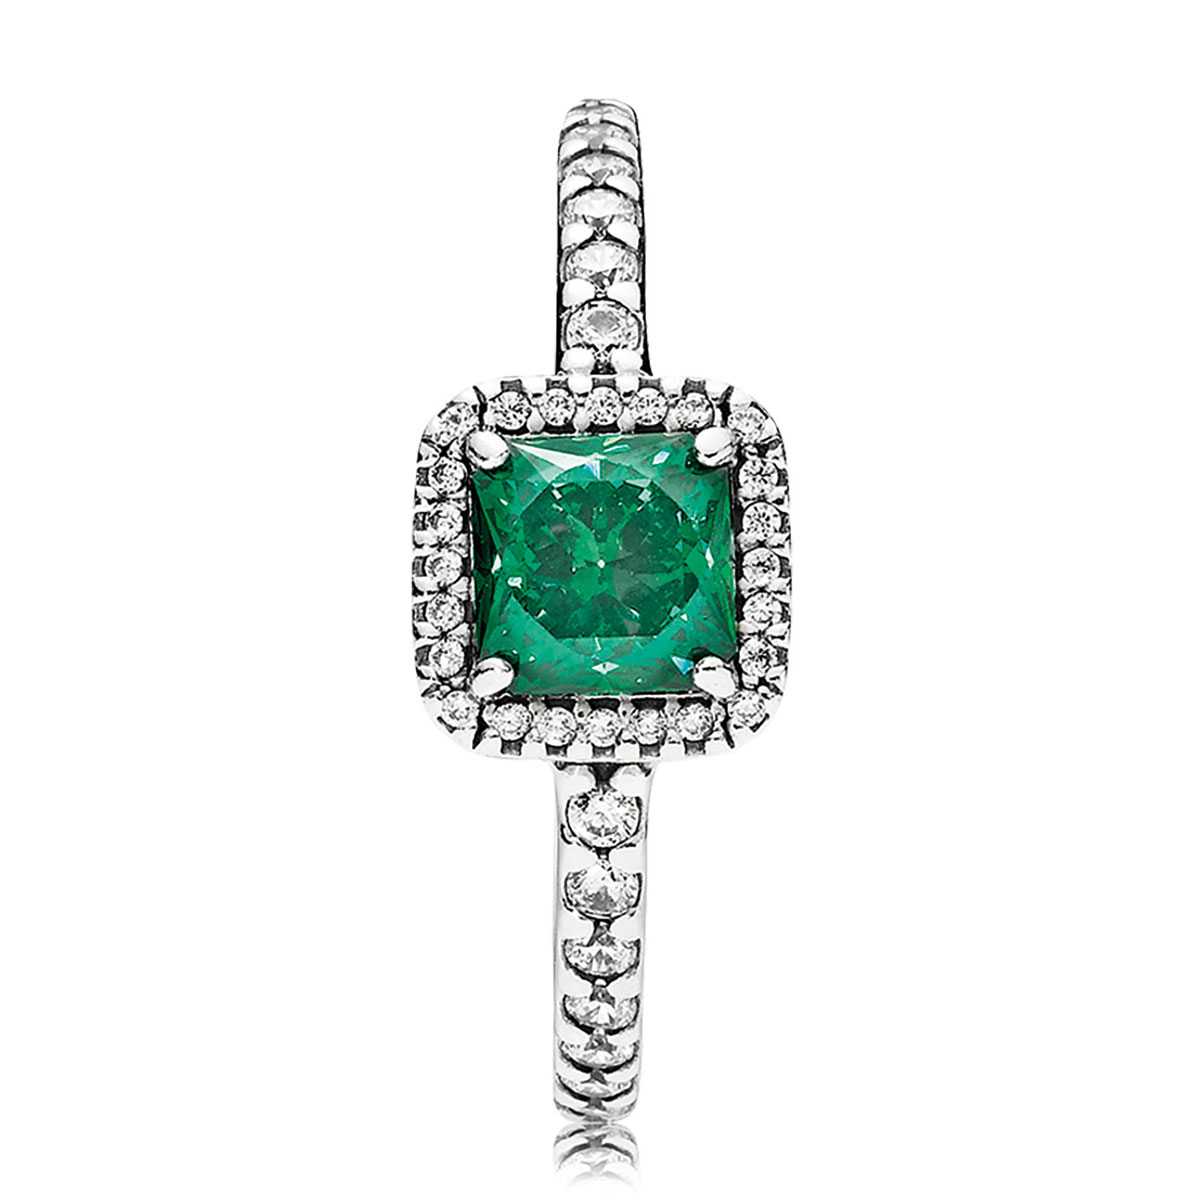 01b63e5f2 ... coupon pandora timeless elegance green ring 0b10b 8dfe2